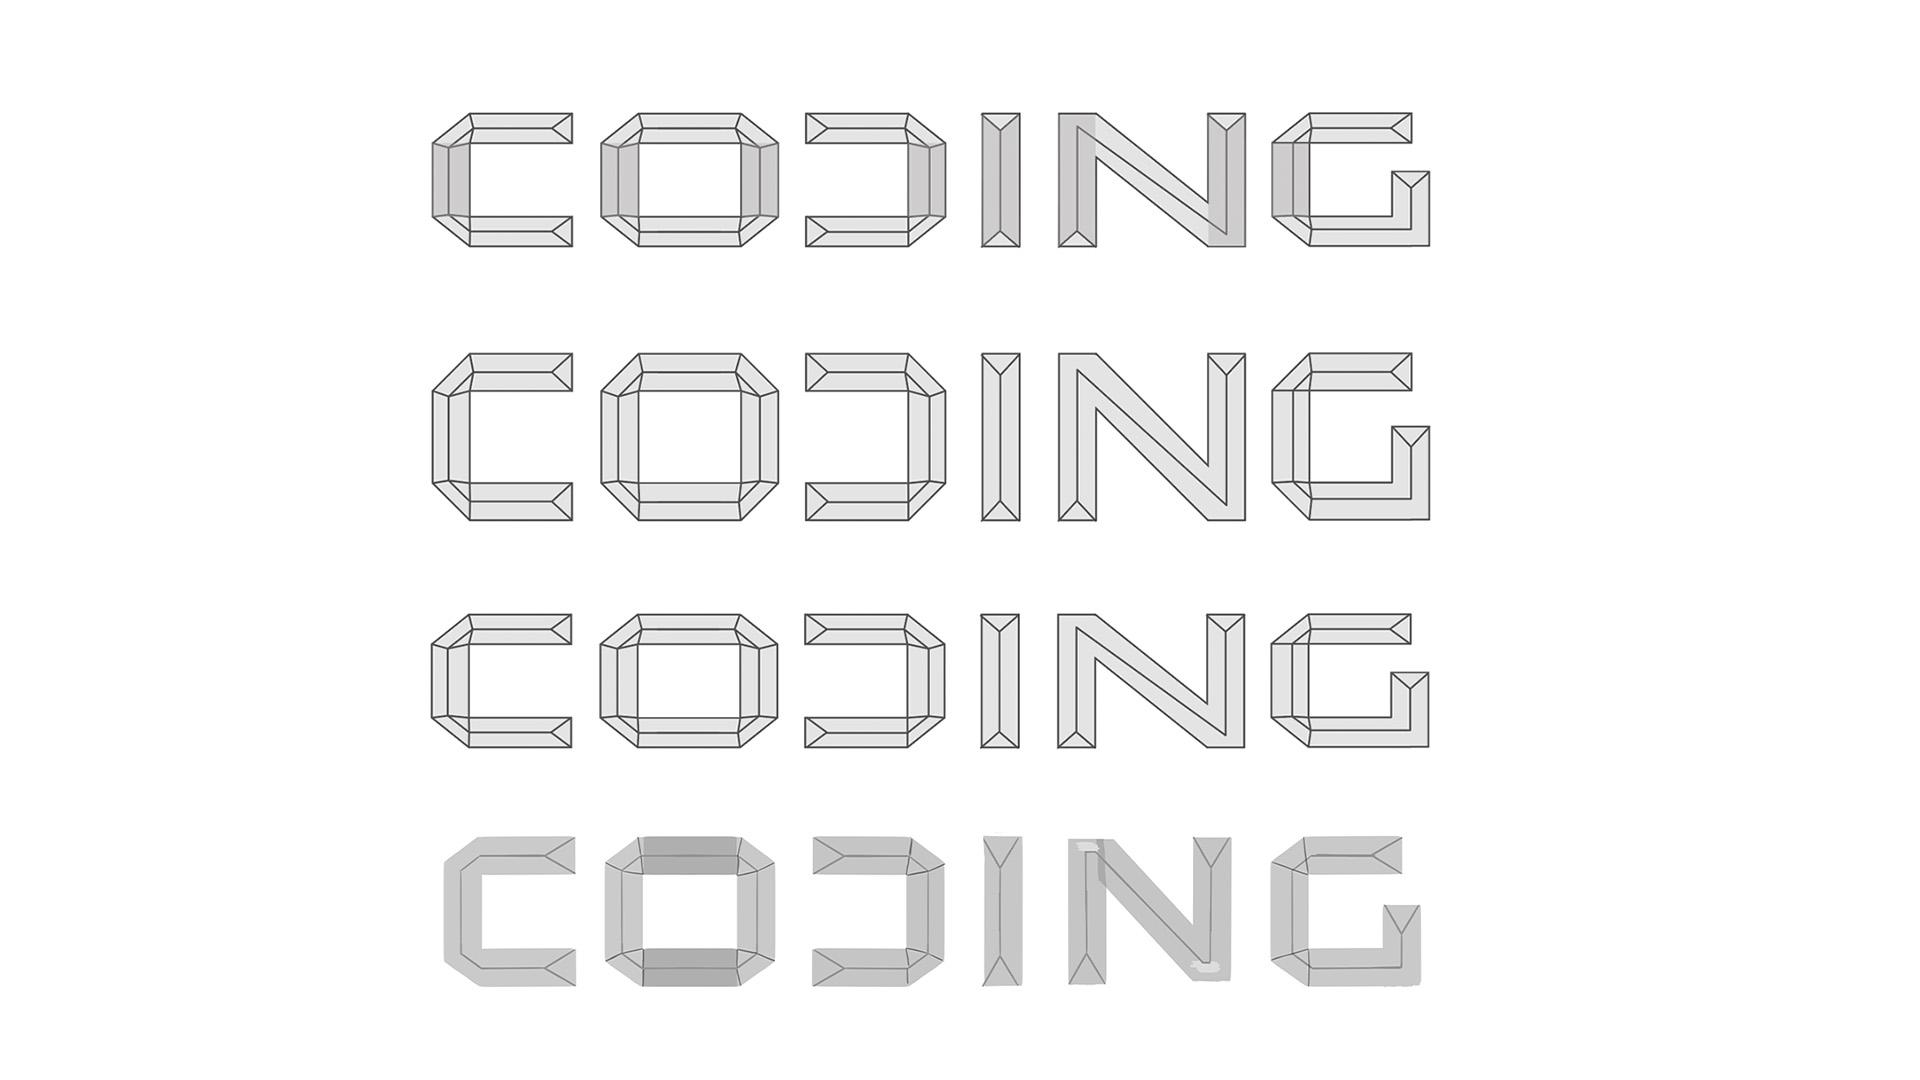 roofstudio_juni-learning_coding-02-1